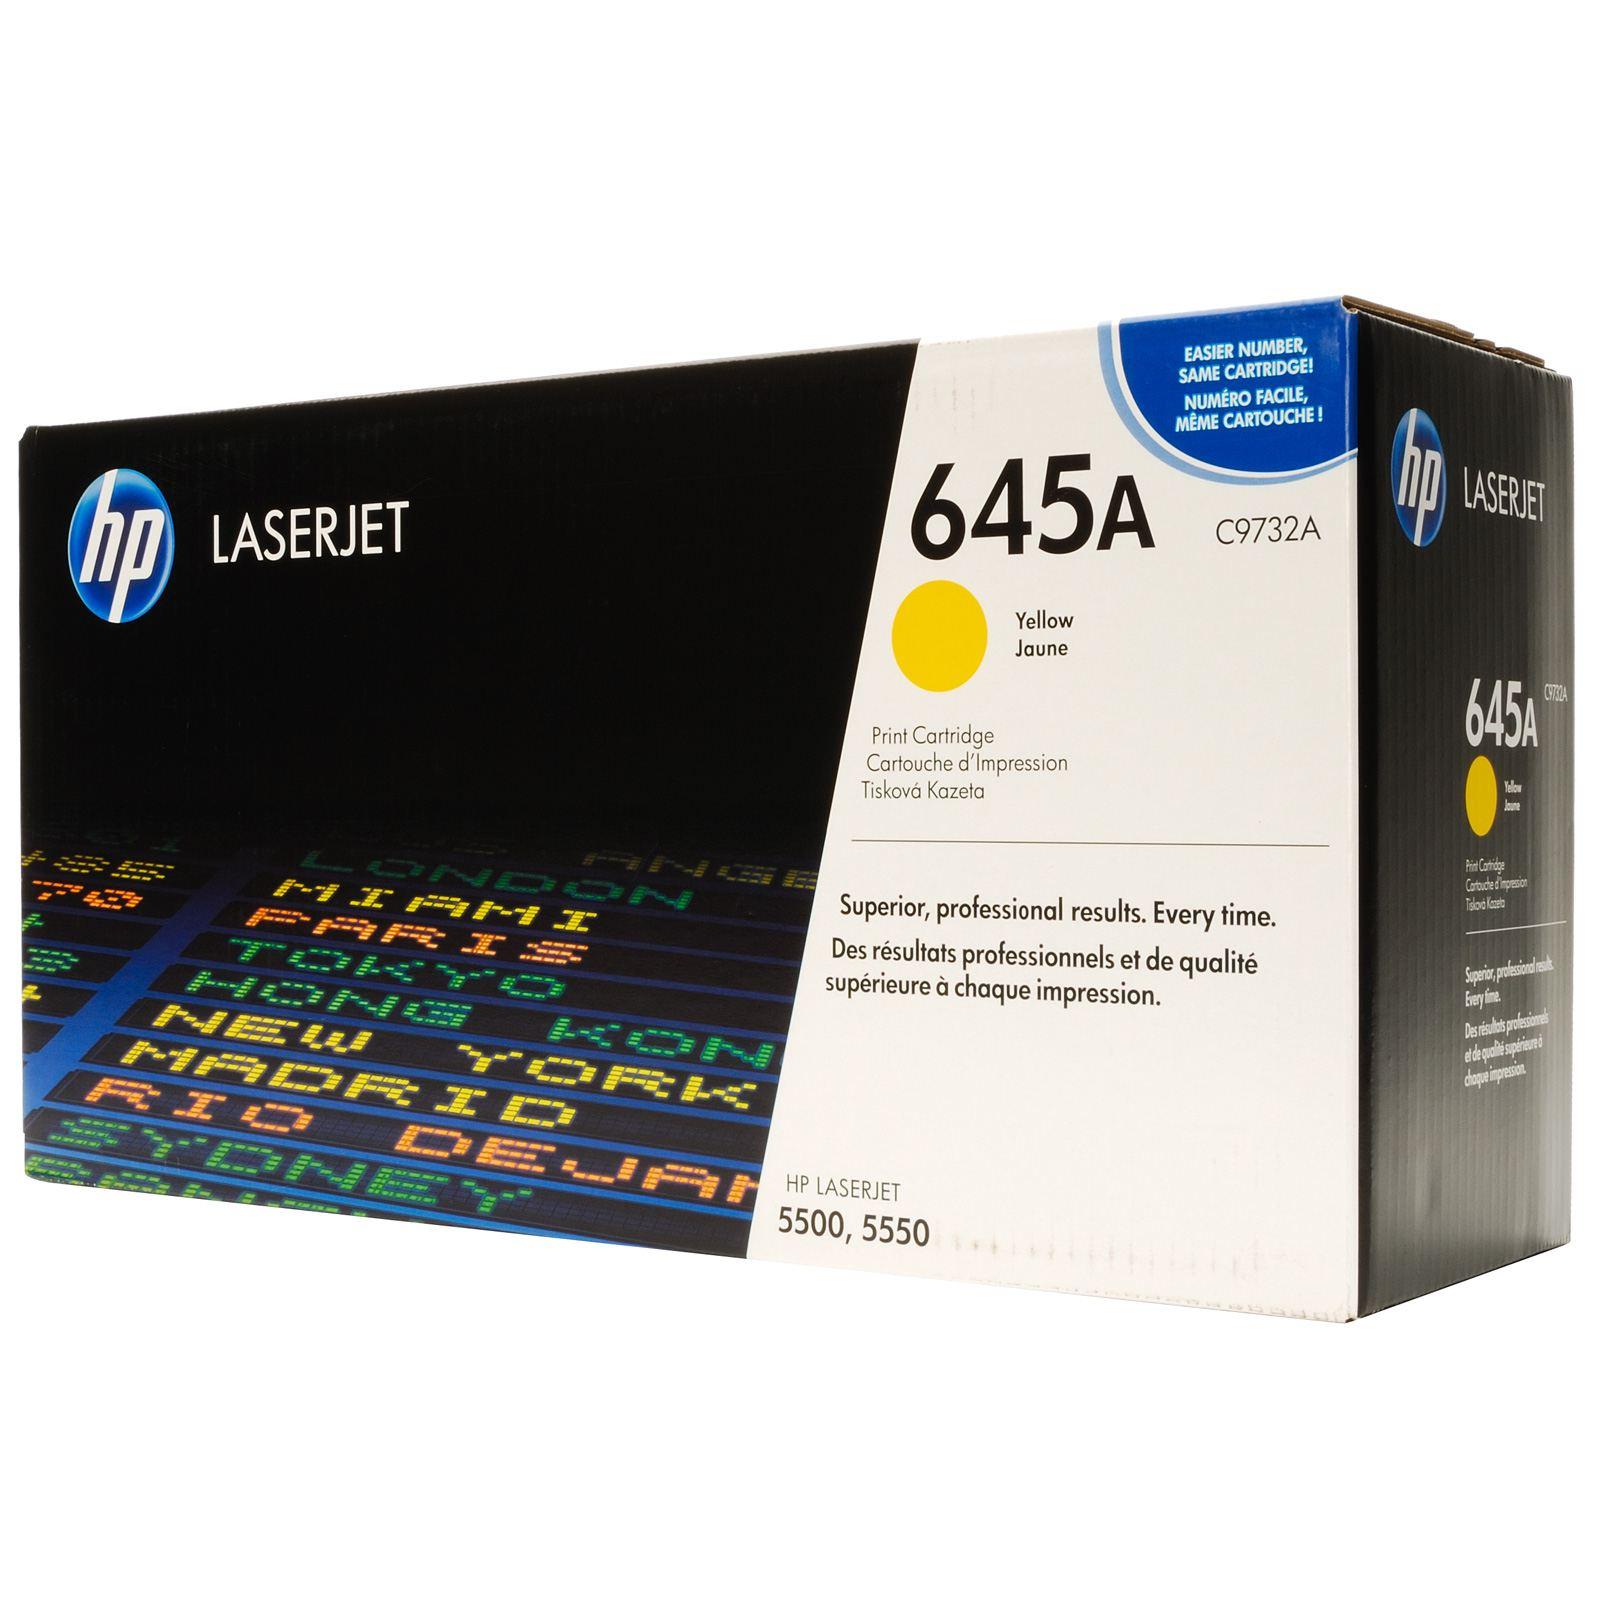 Заправка картриджа C9732A для HP Color LaserJet 5500